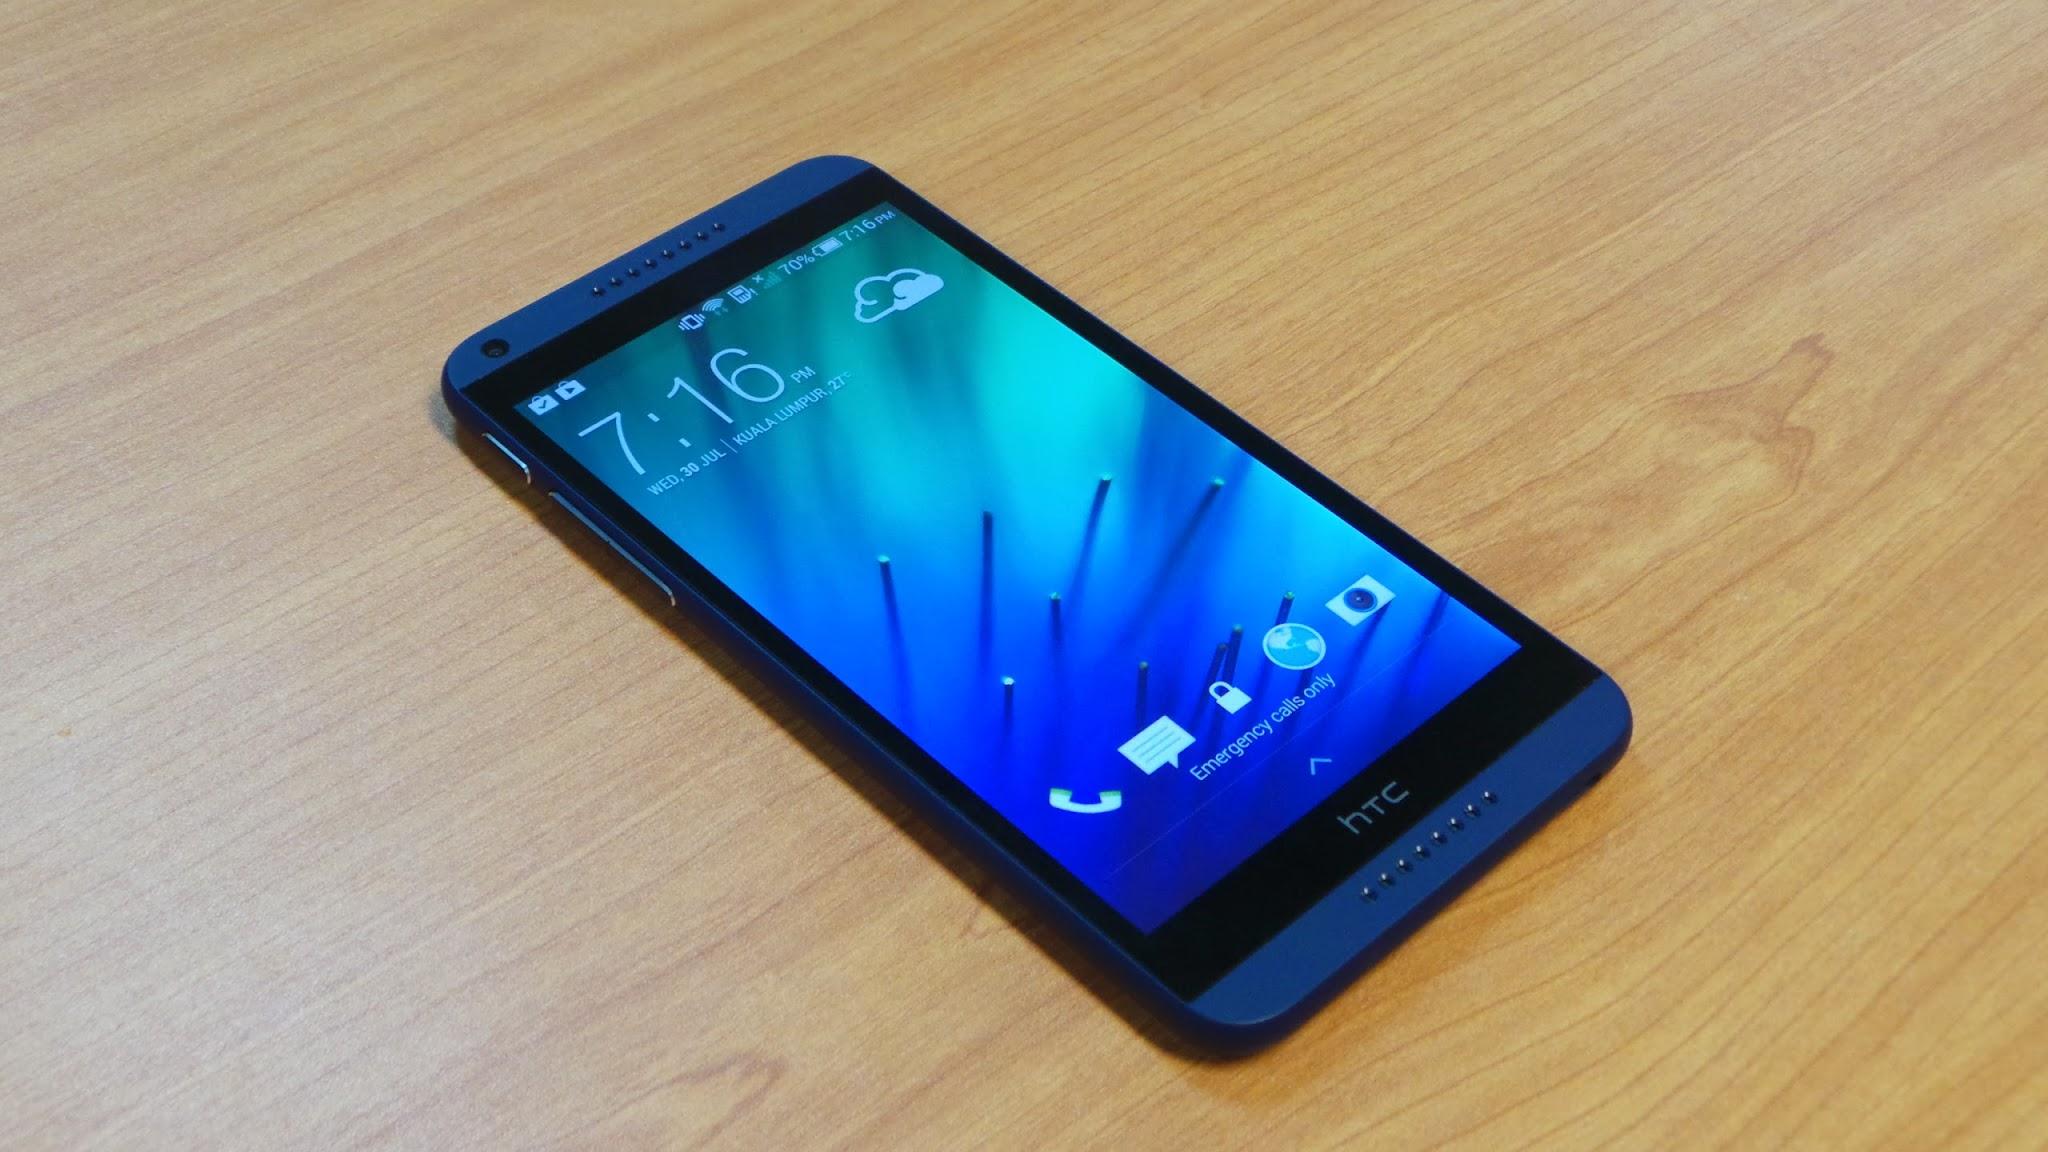 HTC Desire 816 Full Review - TechSlack